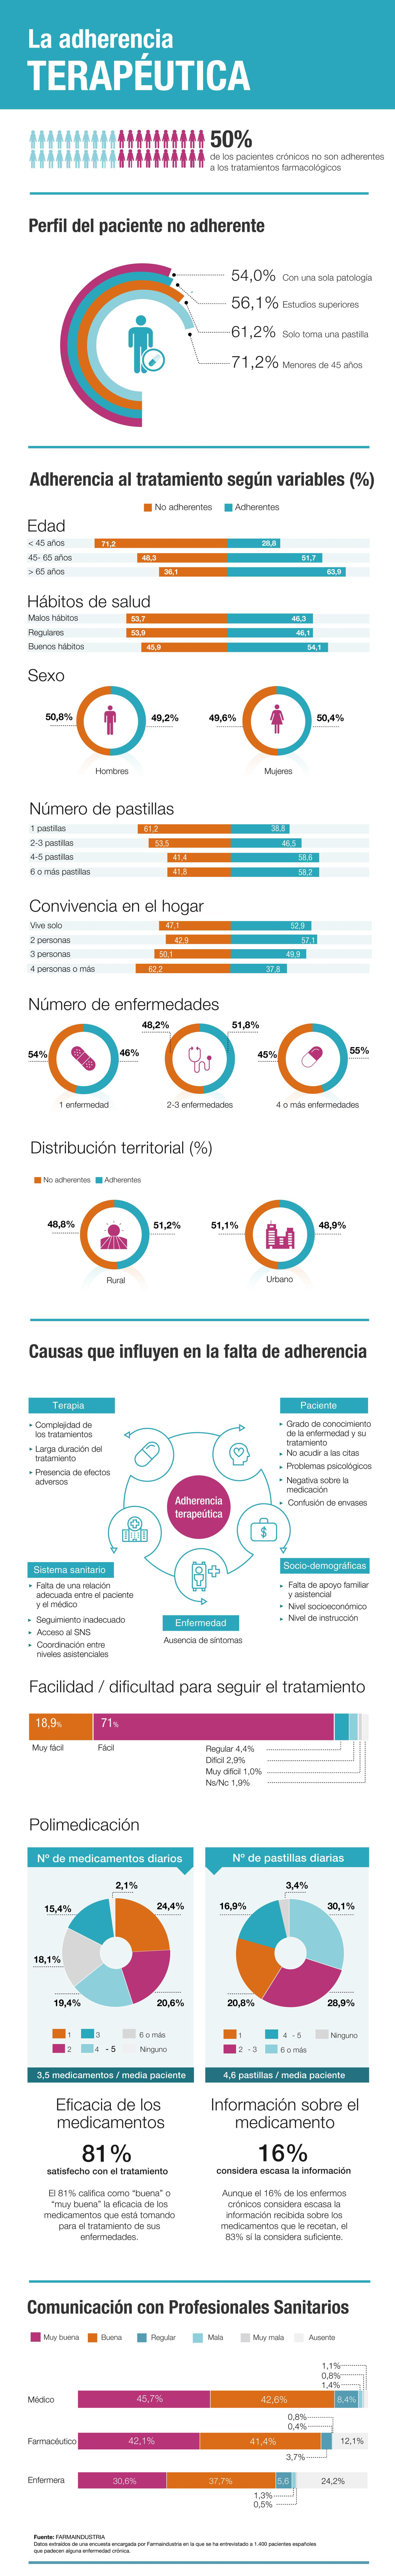 farmaindustria_adherencia-terapeutica_v3-01